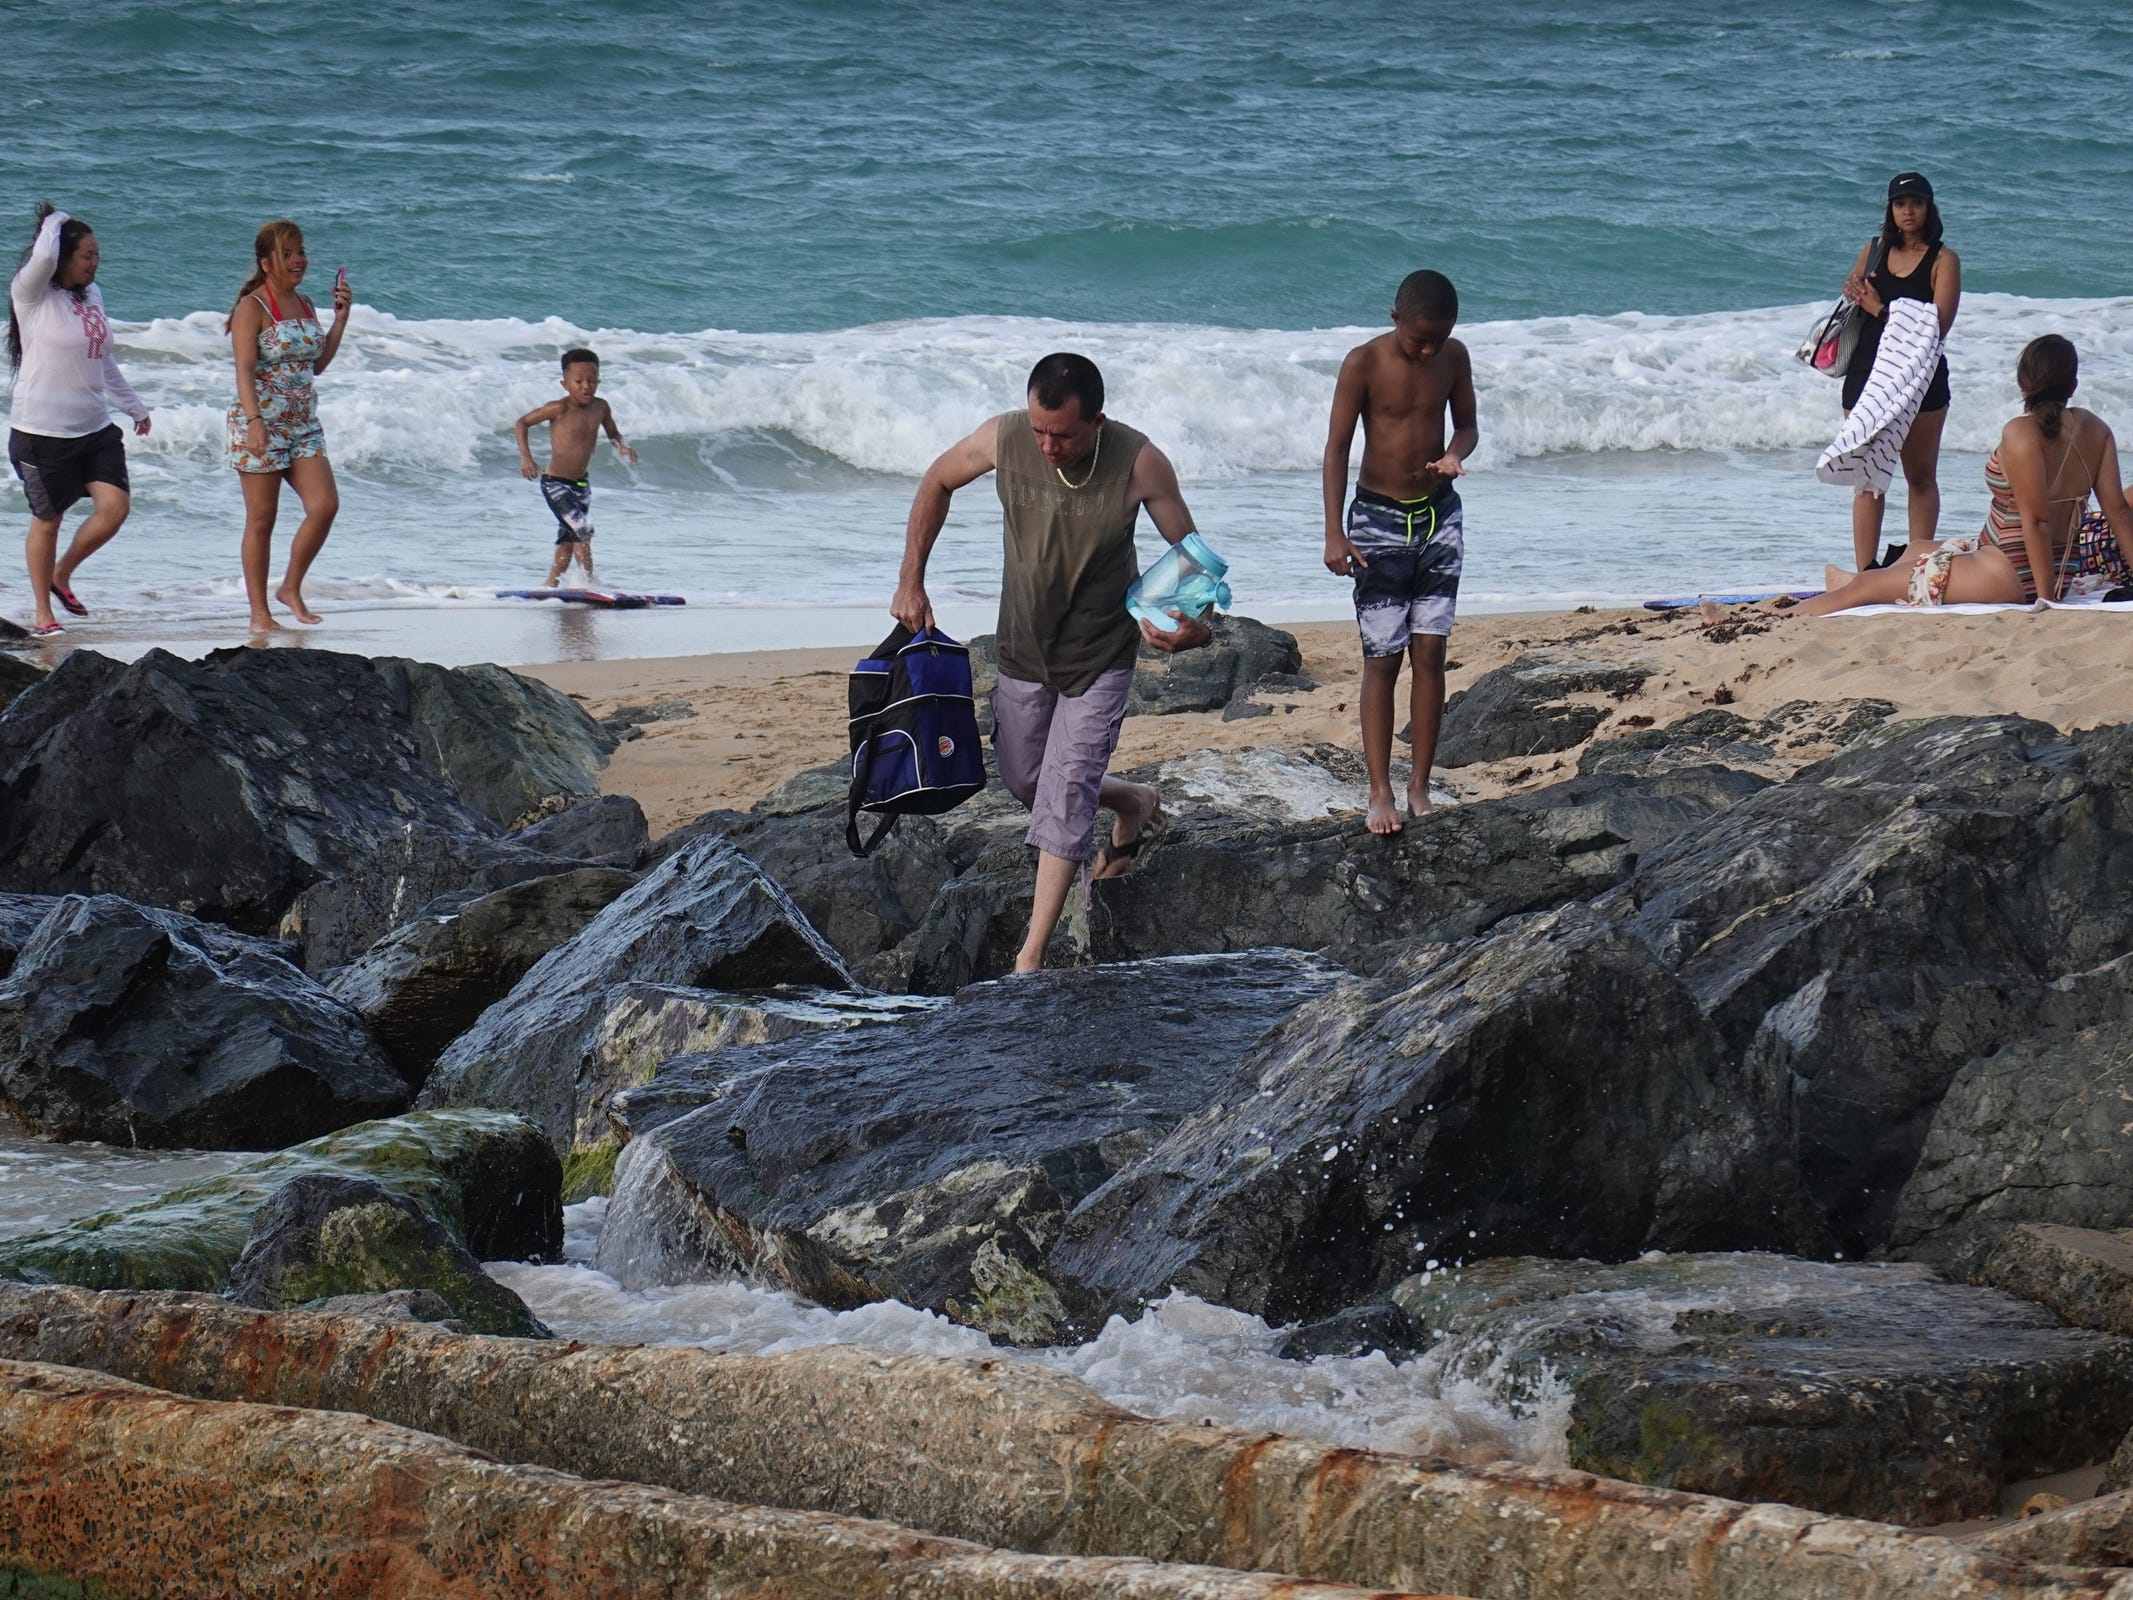 Ten months after hurricane Maria hit Puerto Rico people walk around the beach on the Atlantic Ocean in San Juan.